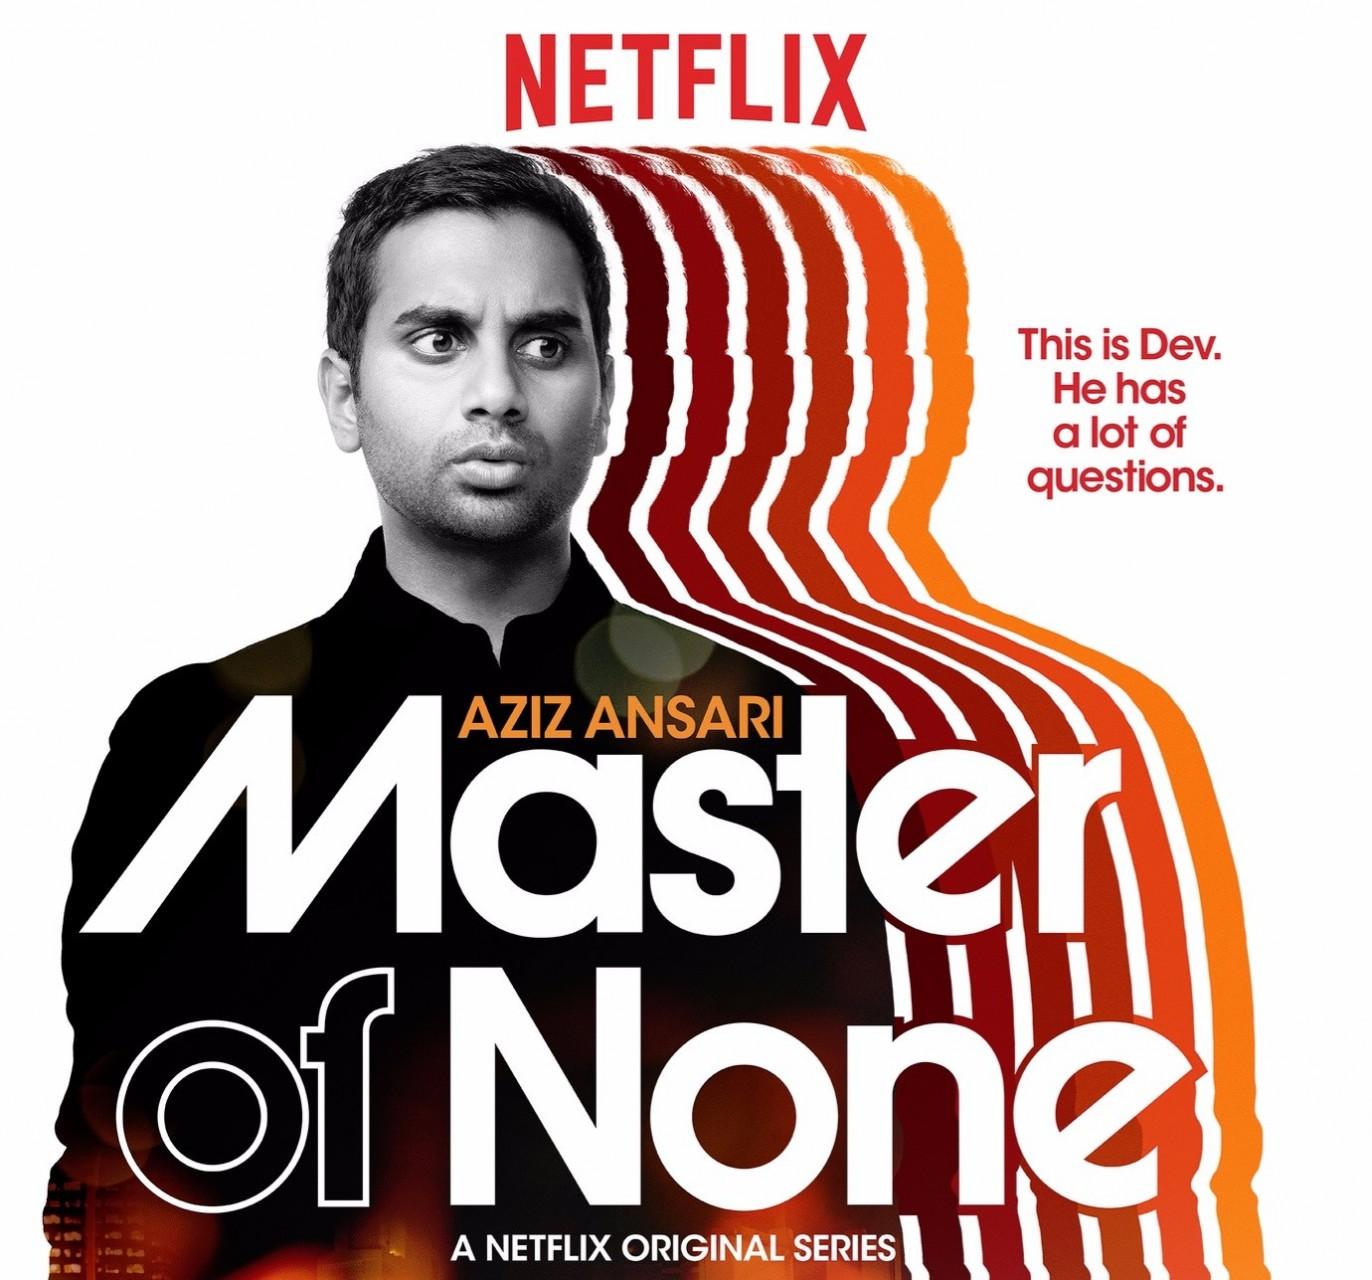 Master-of-None-Poster-Aziz-Ansari